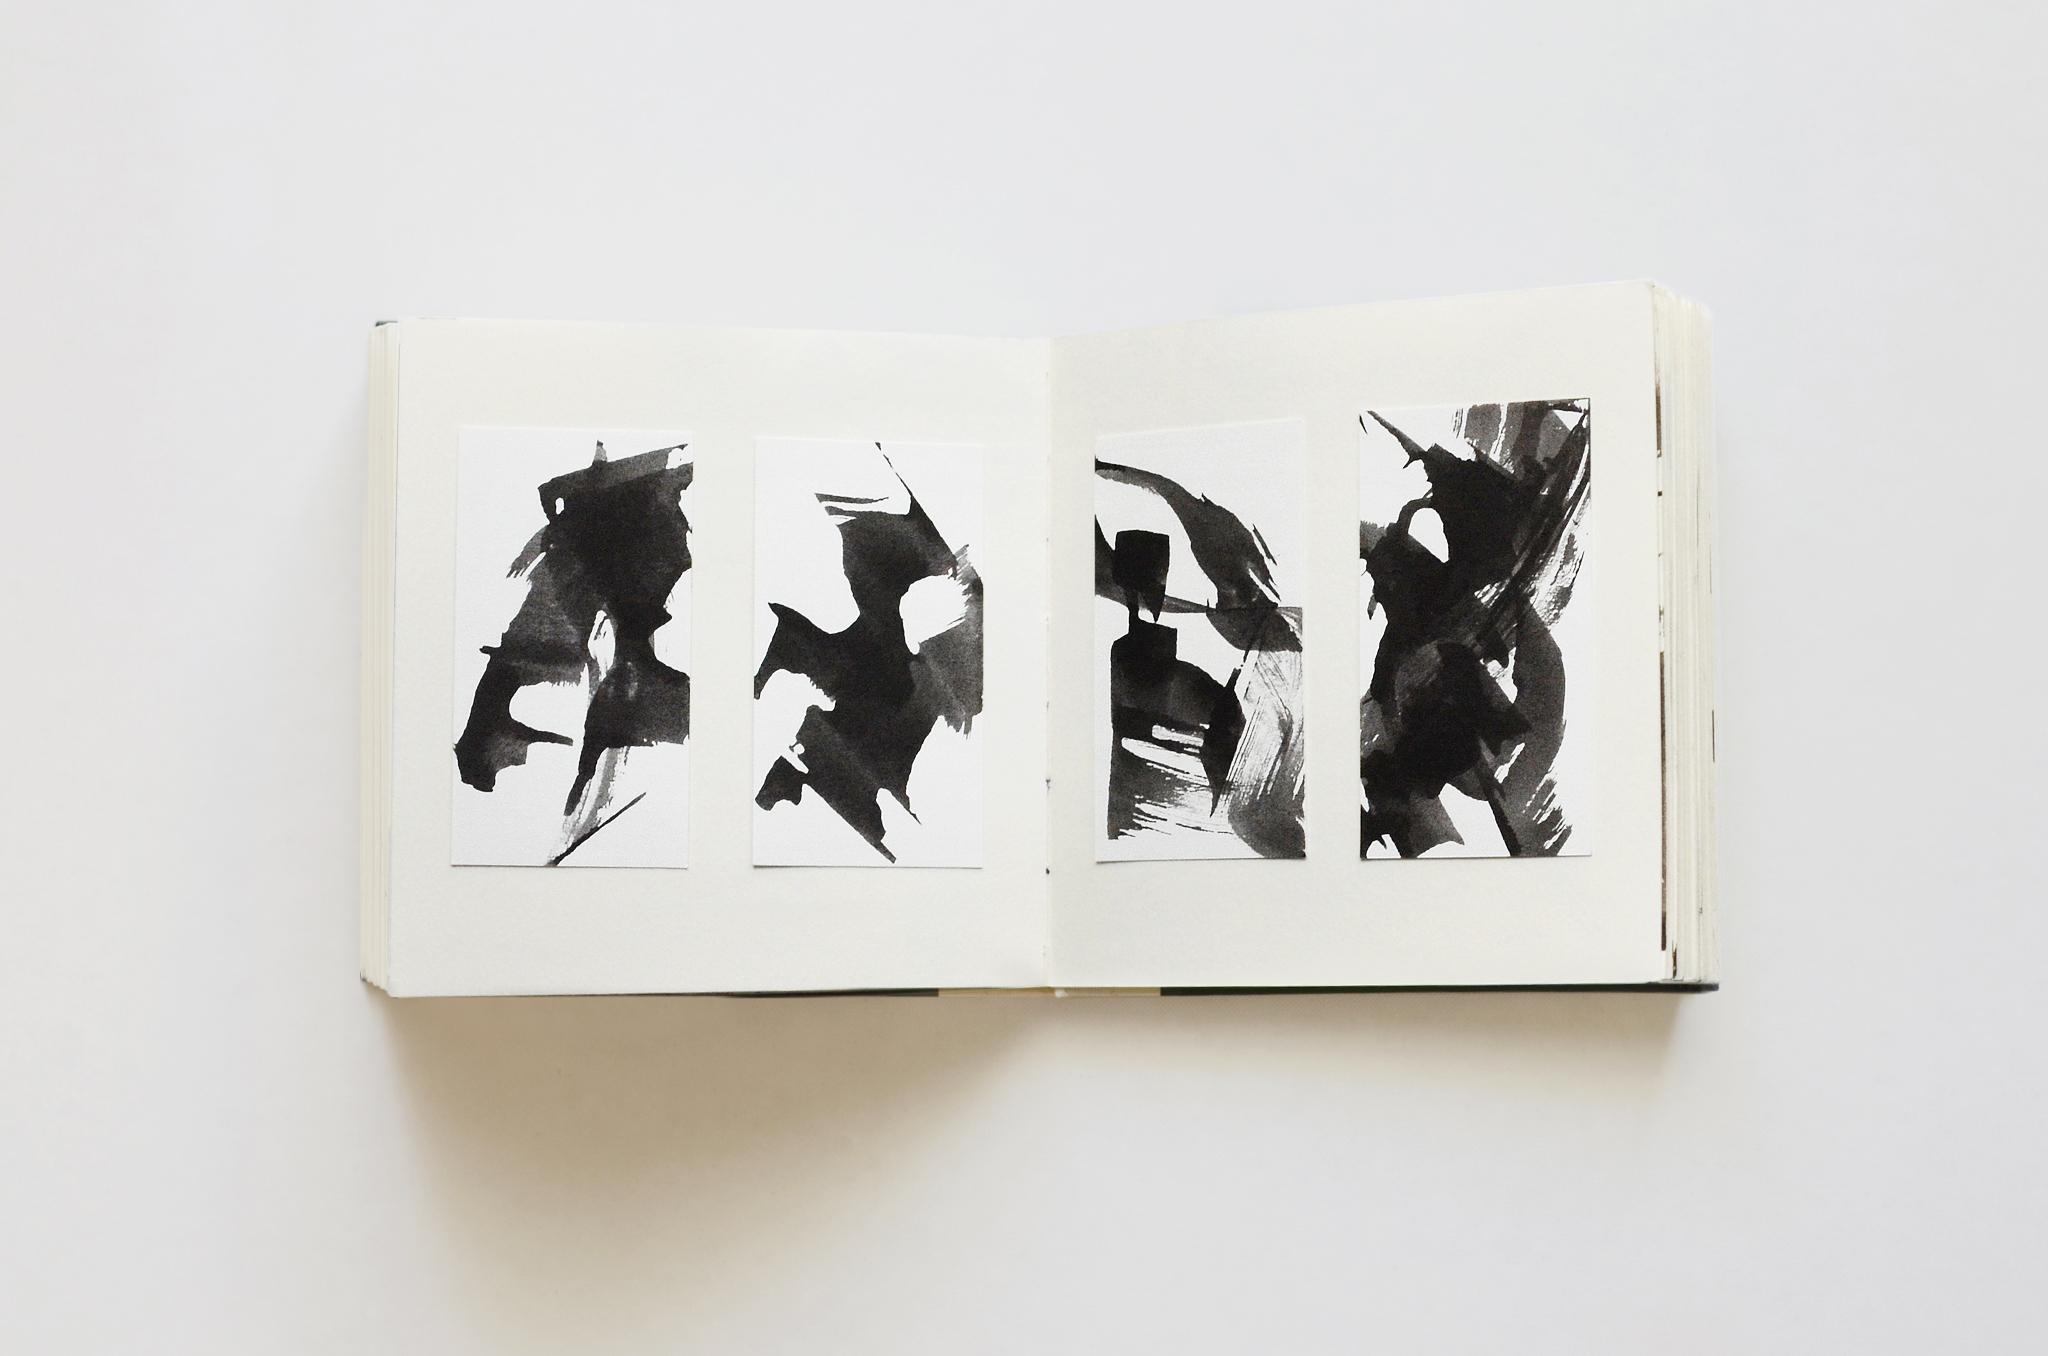 #6, Freie Kalligraphie, Reihe | 20160222 – Hannah Rauß / noe.io